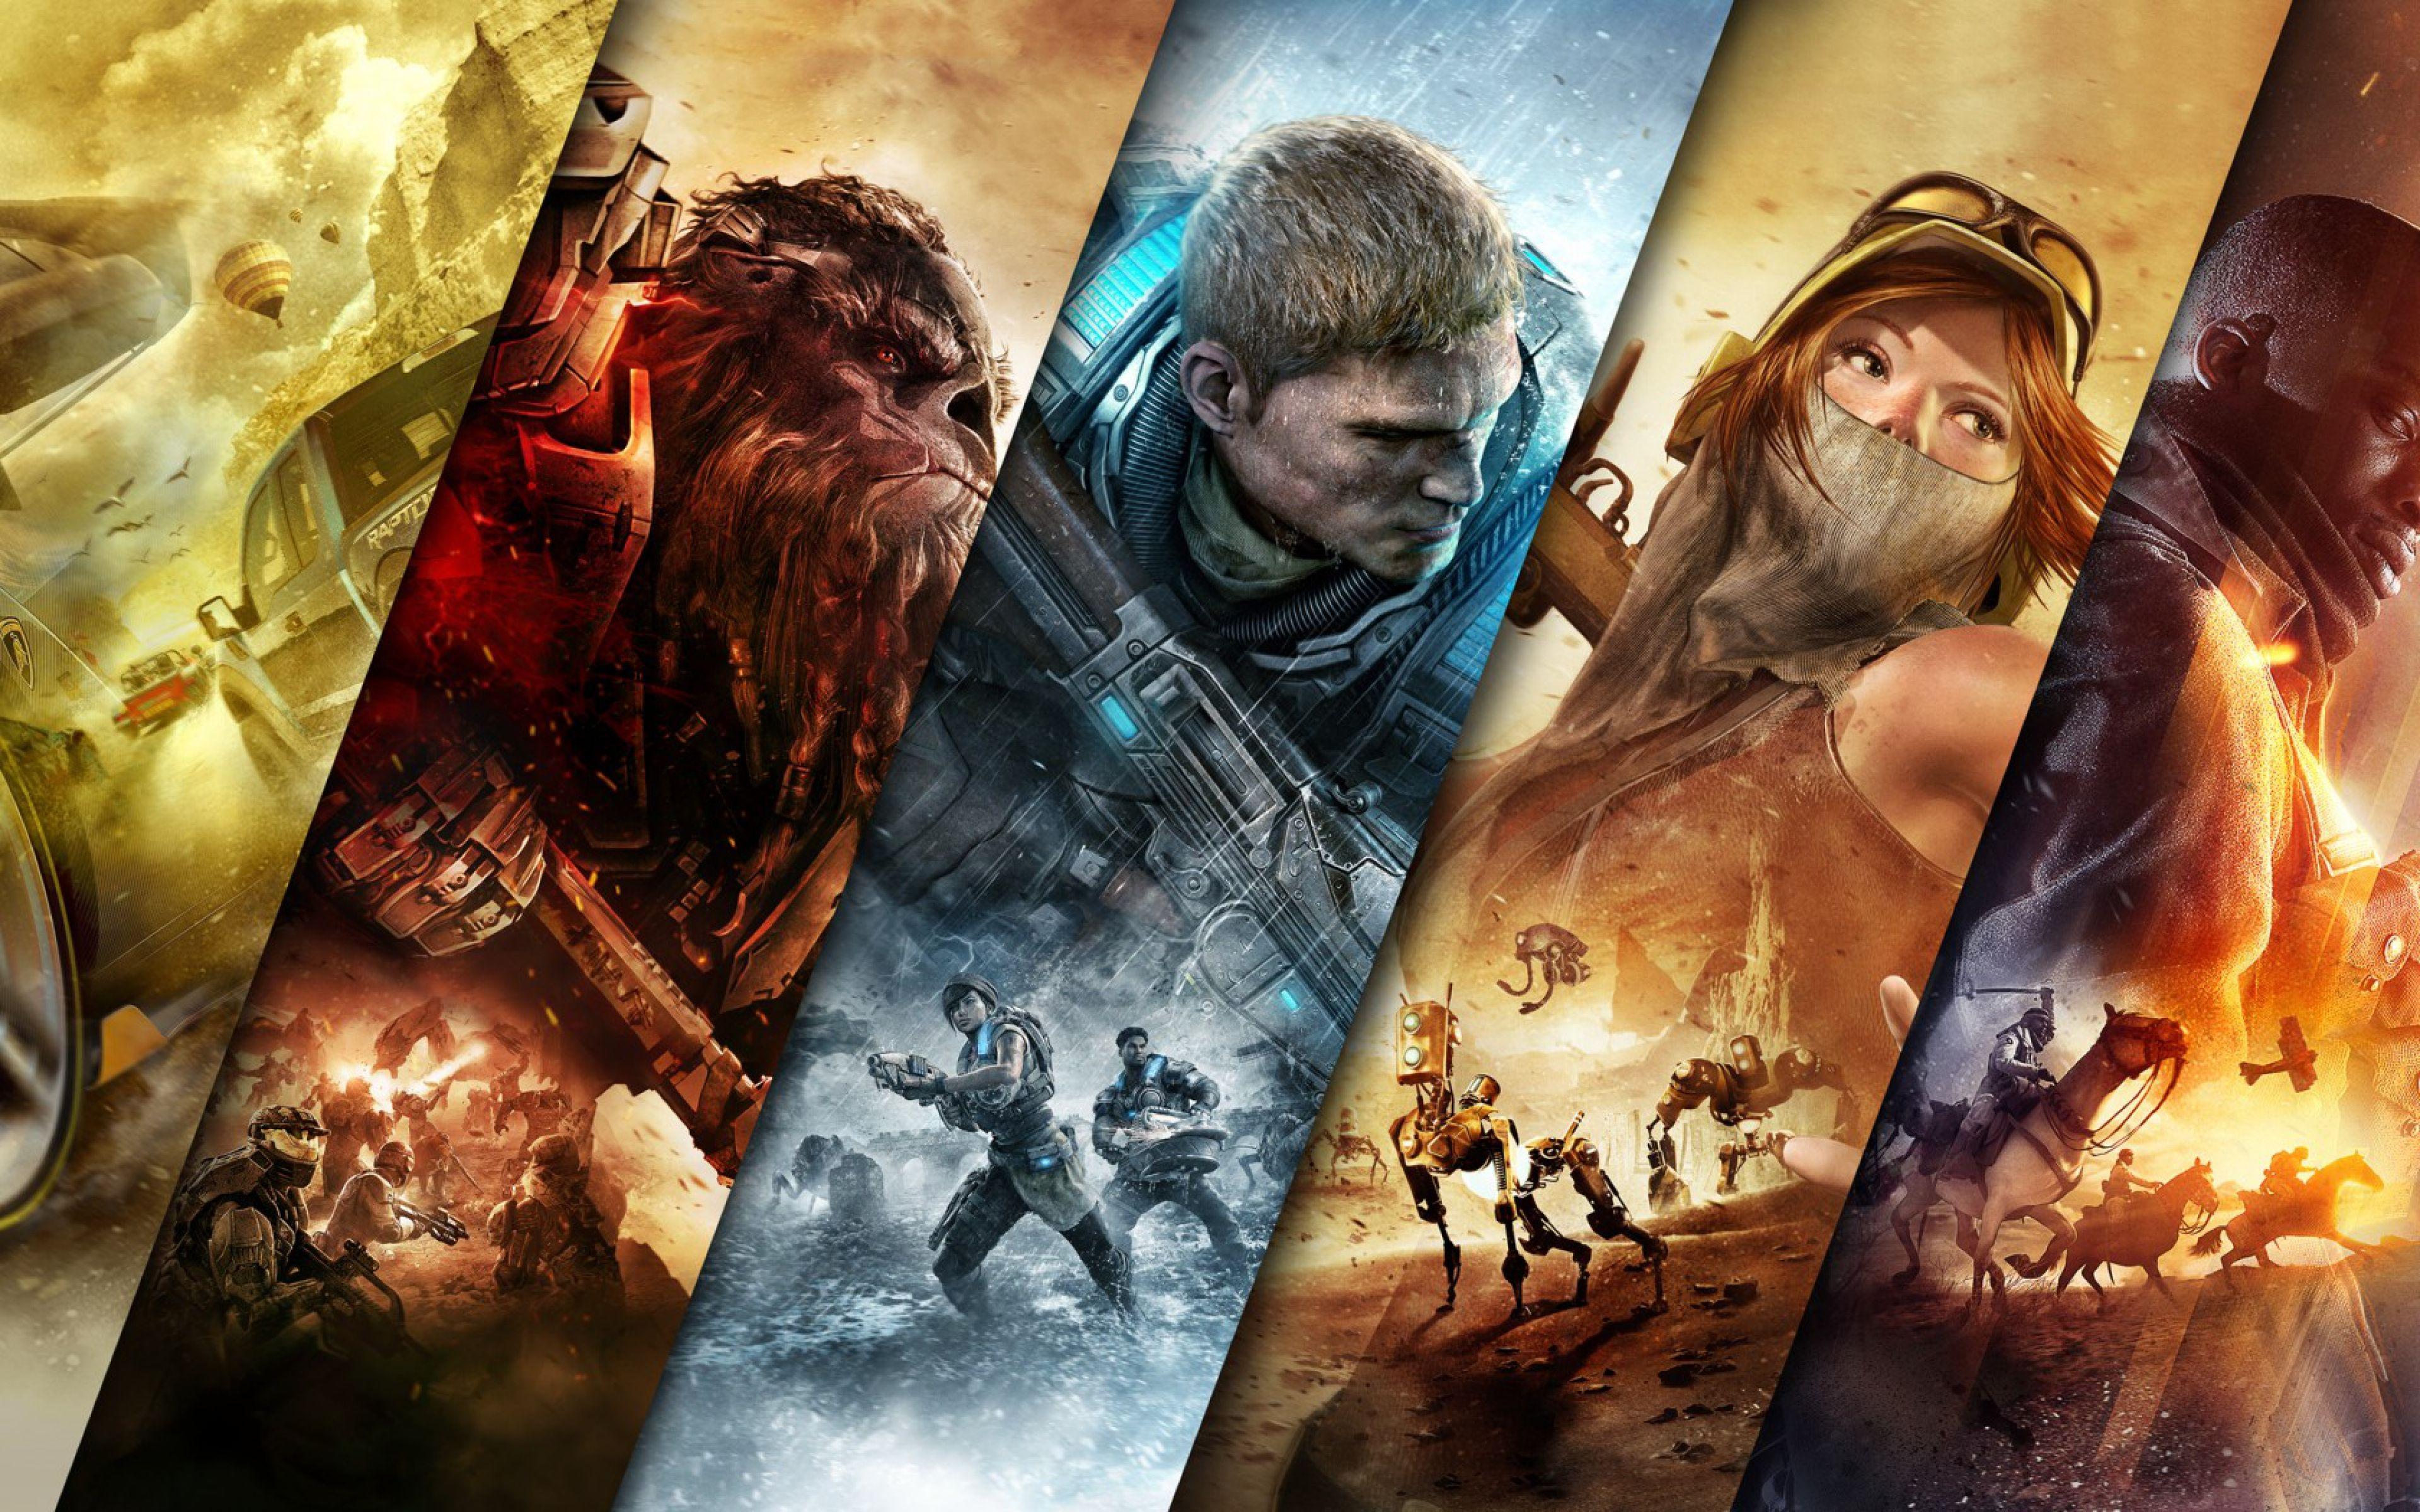 3840x2400 Wallpaper Forza Horizon 3 Halo Wars 2 Gears Of War 4 Recore Battlefield 1 Pc Games Wallpapers Xbox Games Gears Of War